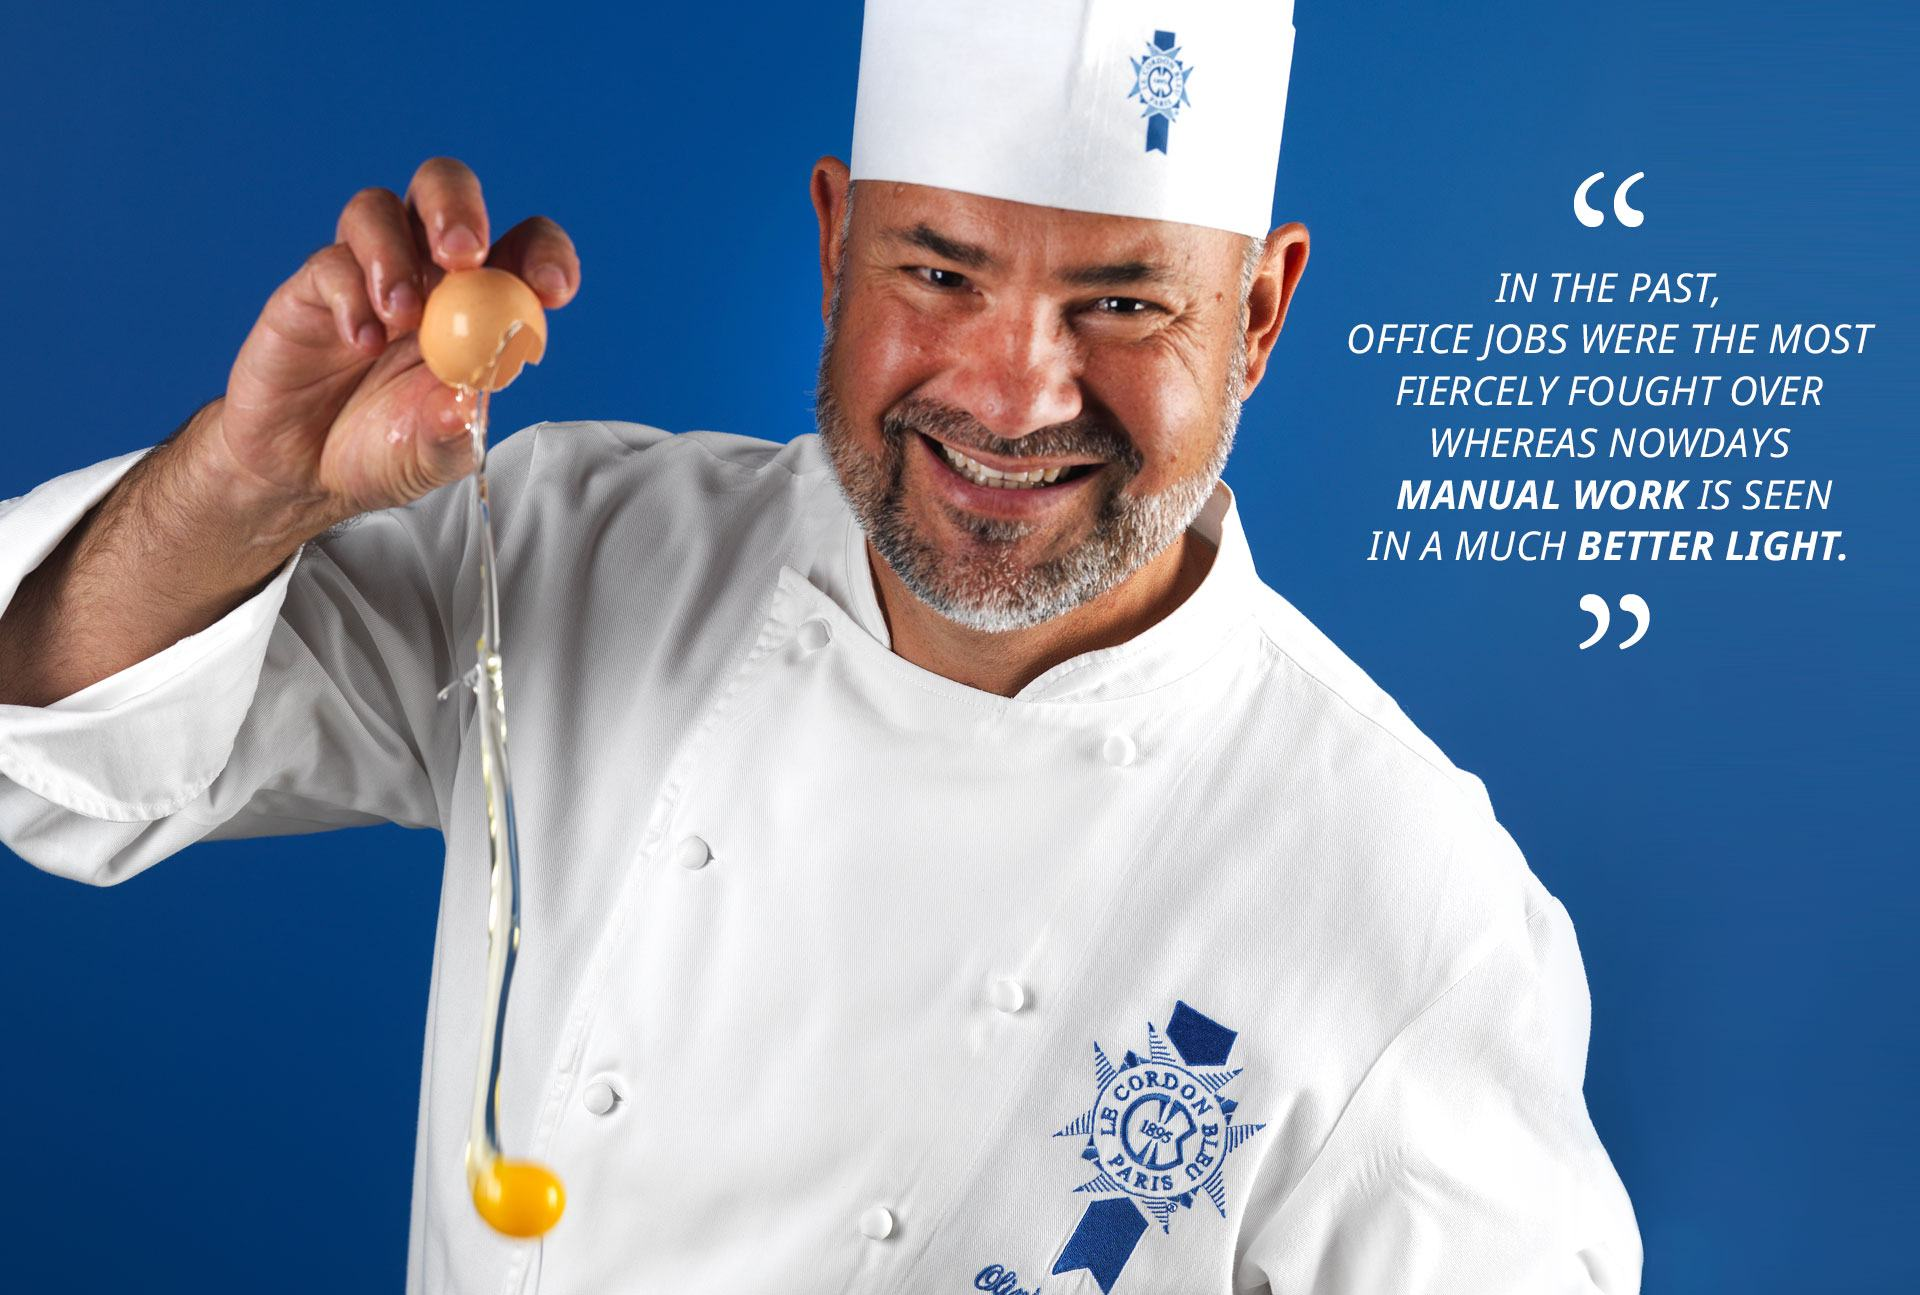 Pastry Chef Olivier Mahut